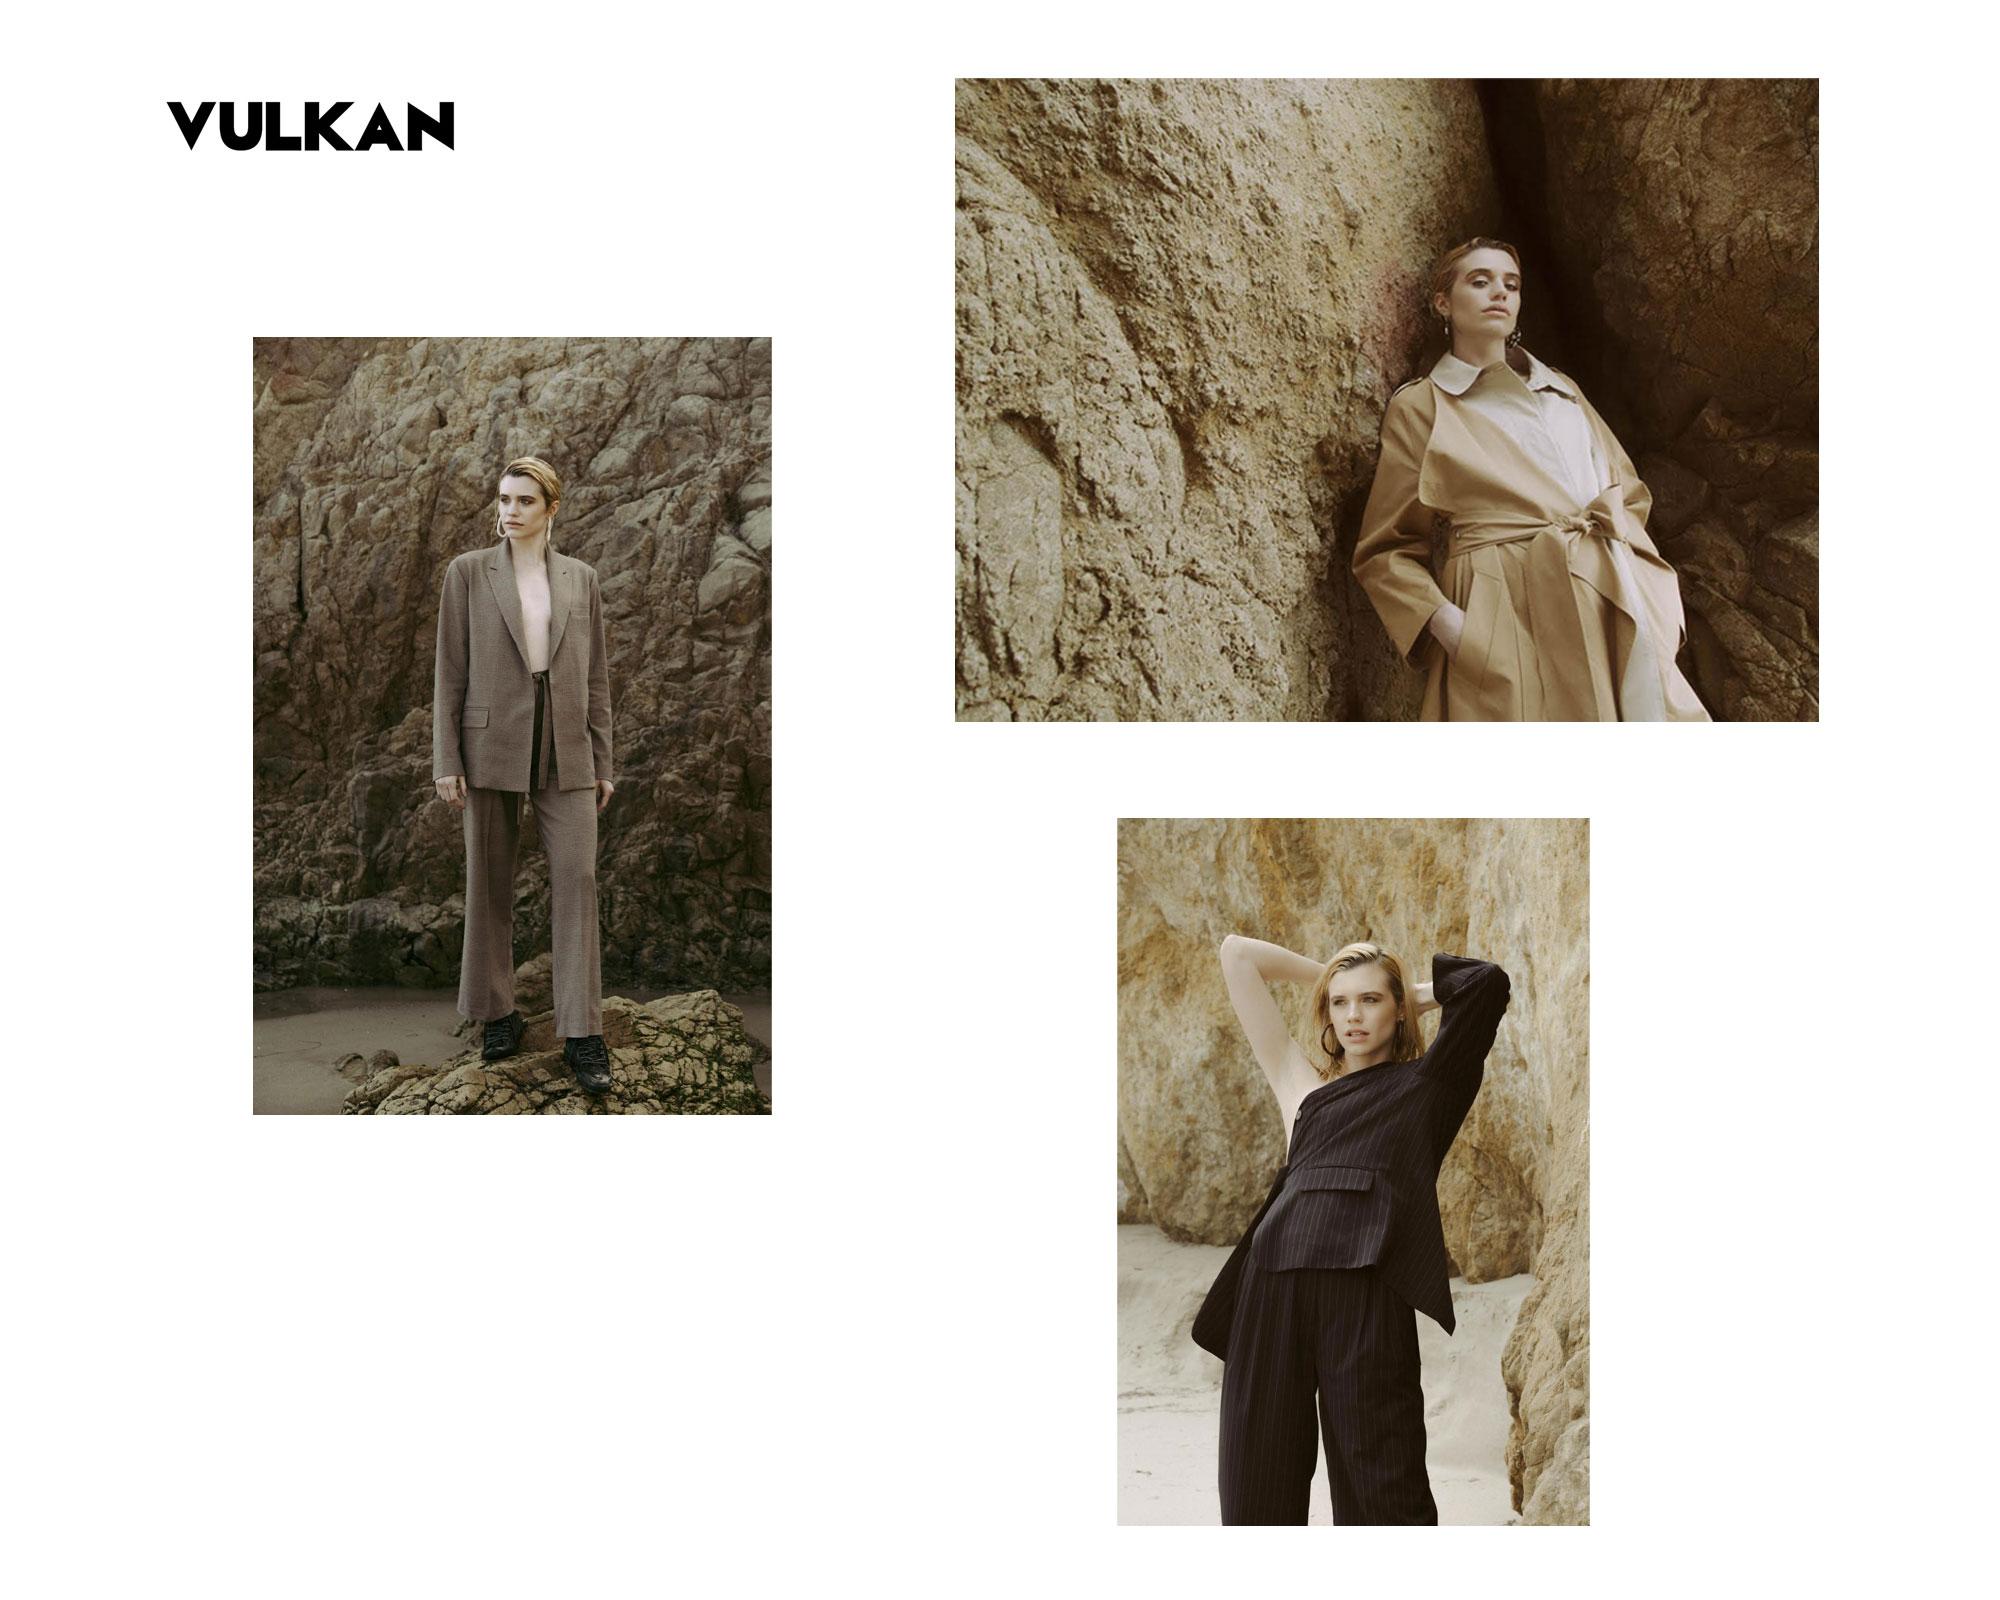 Vulkan-Magazine_.jpg